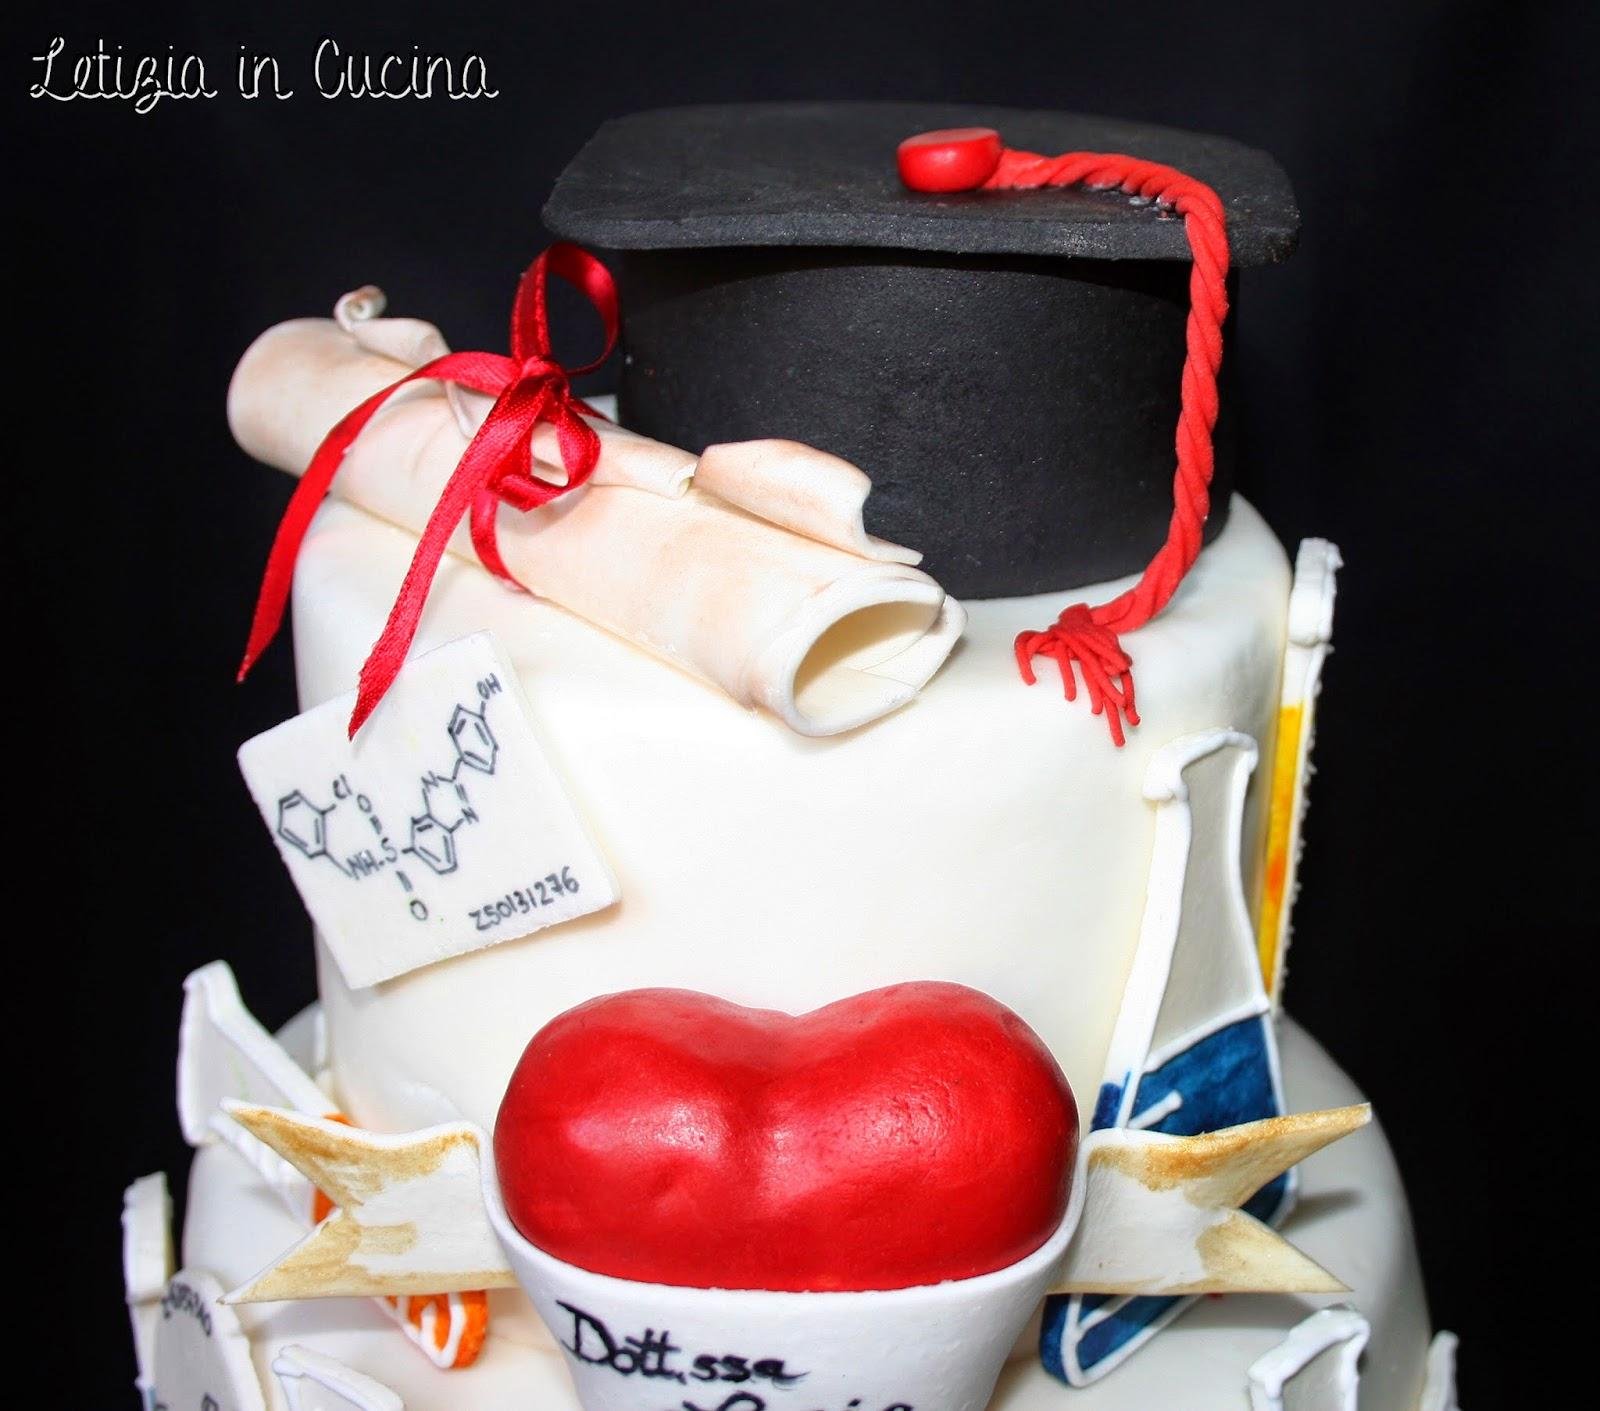 Letizia in cucina torta laurea lucia 2 for Decorazioni per torte di laurea